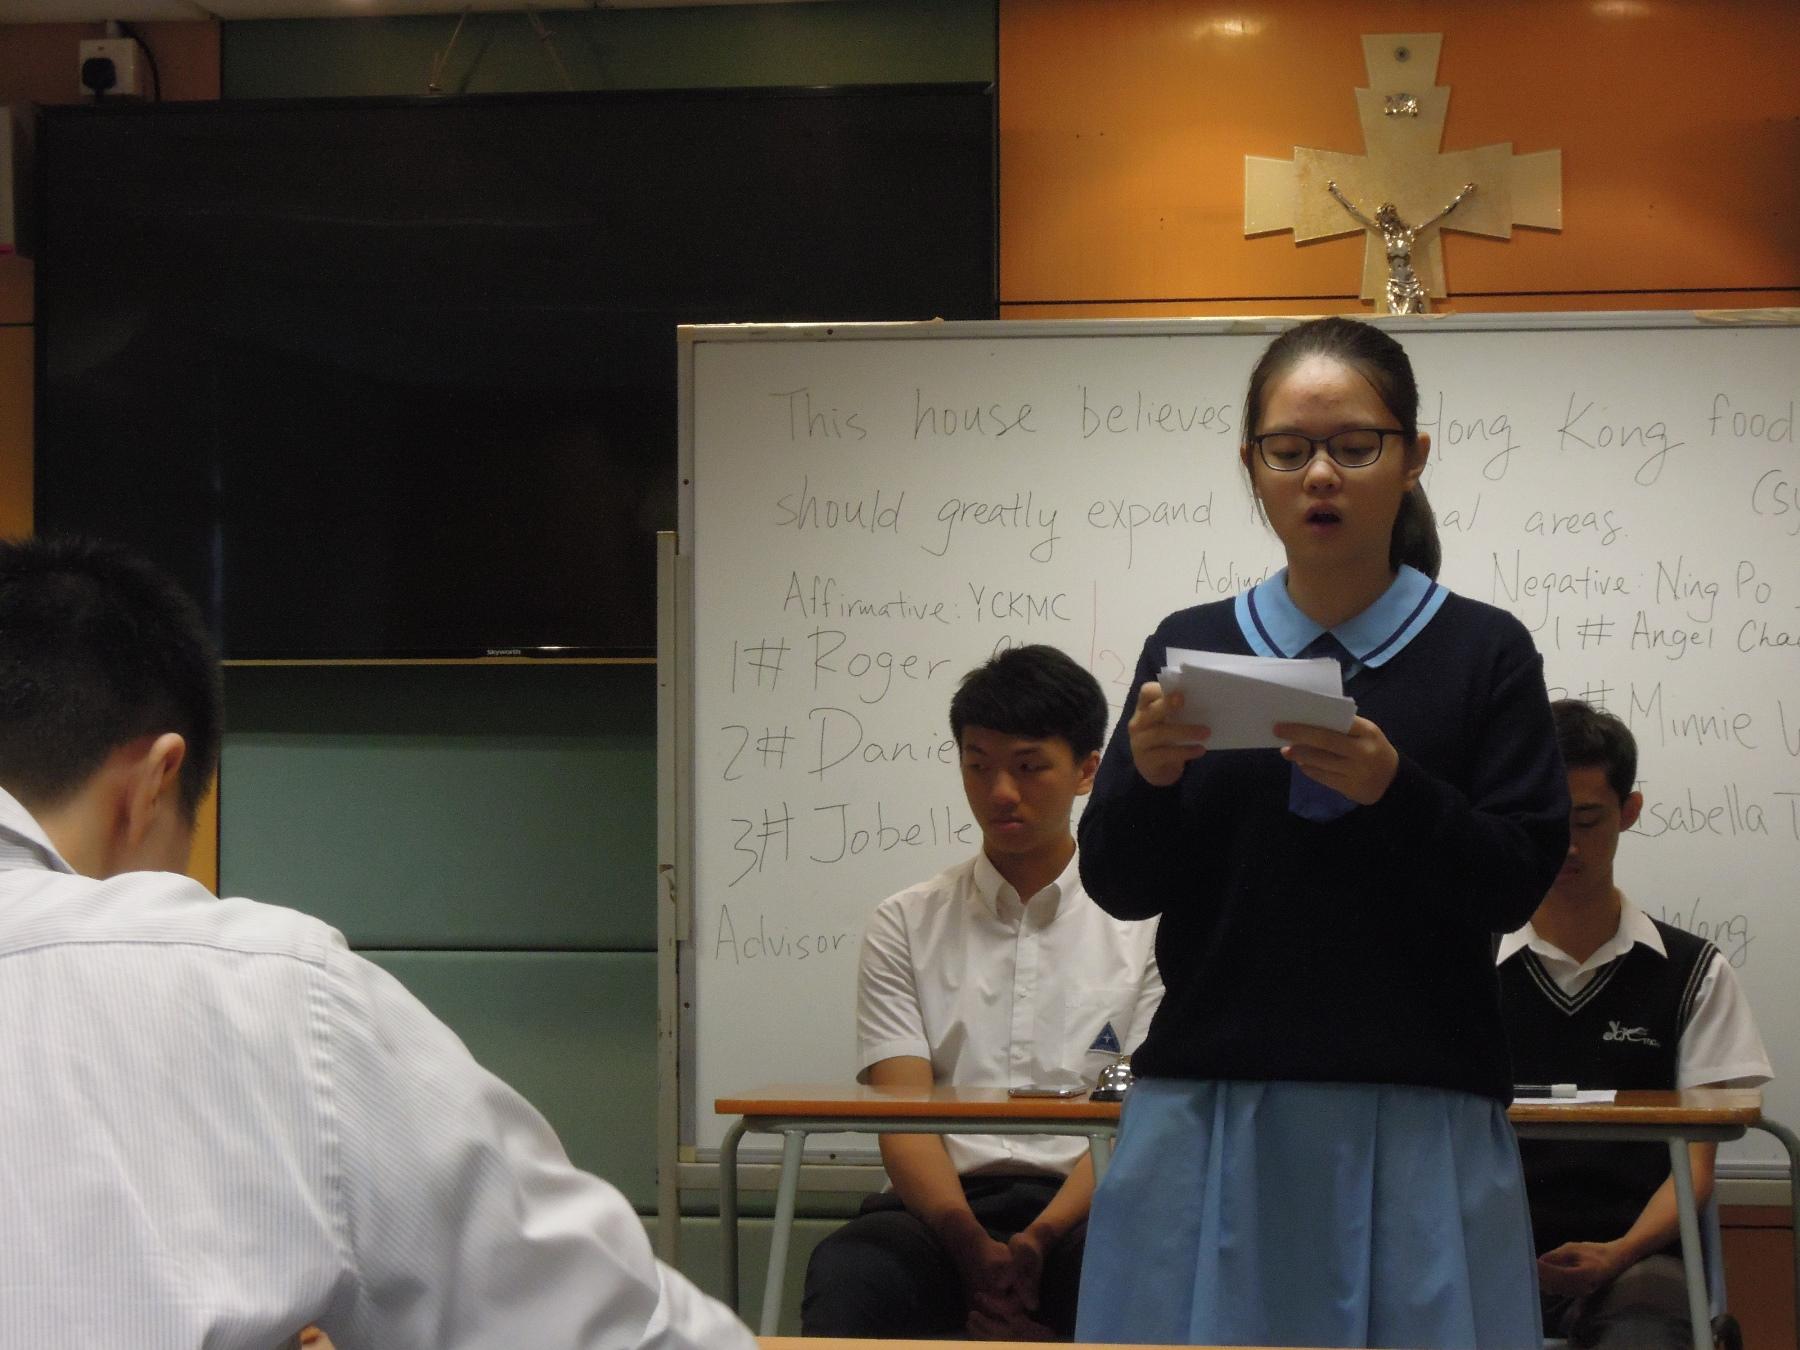 http://www.npc.edu.hk/sites/default/files/dscn0065.jpg